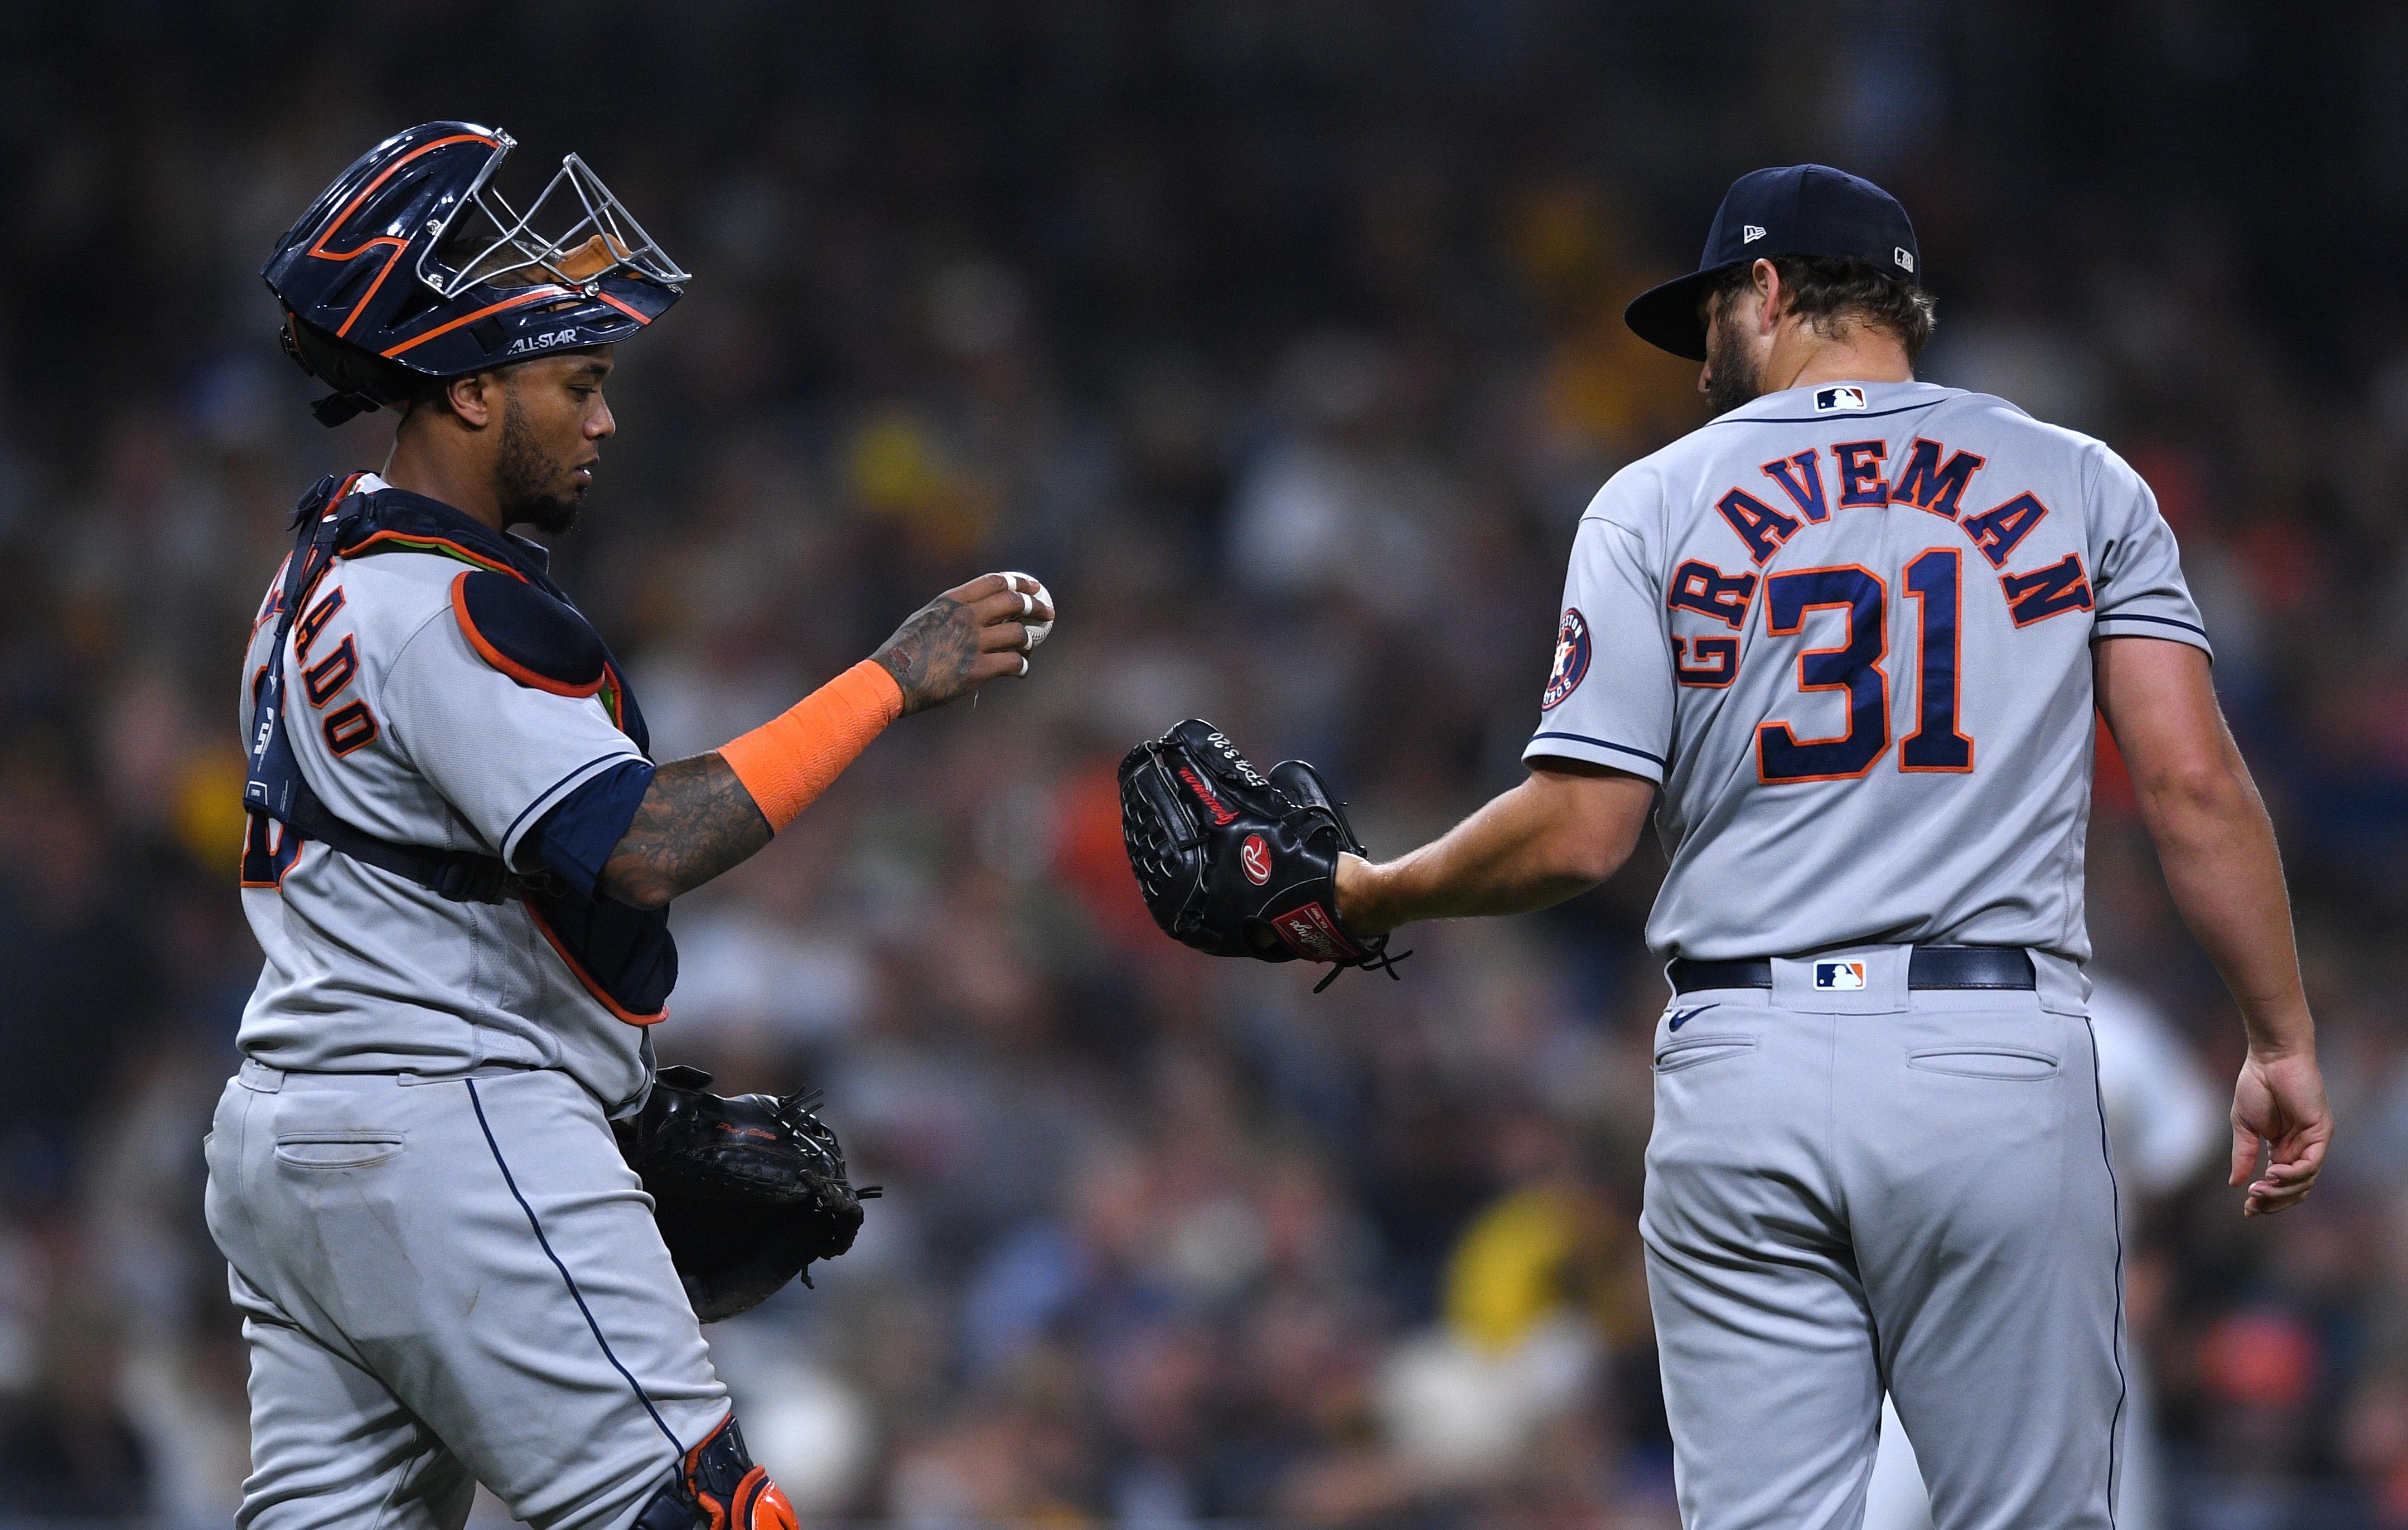 MLB: Houston Astros at San Diego Padres